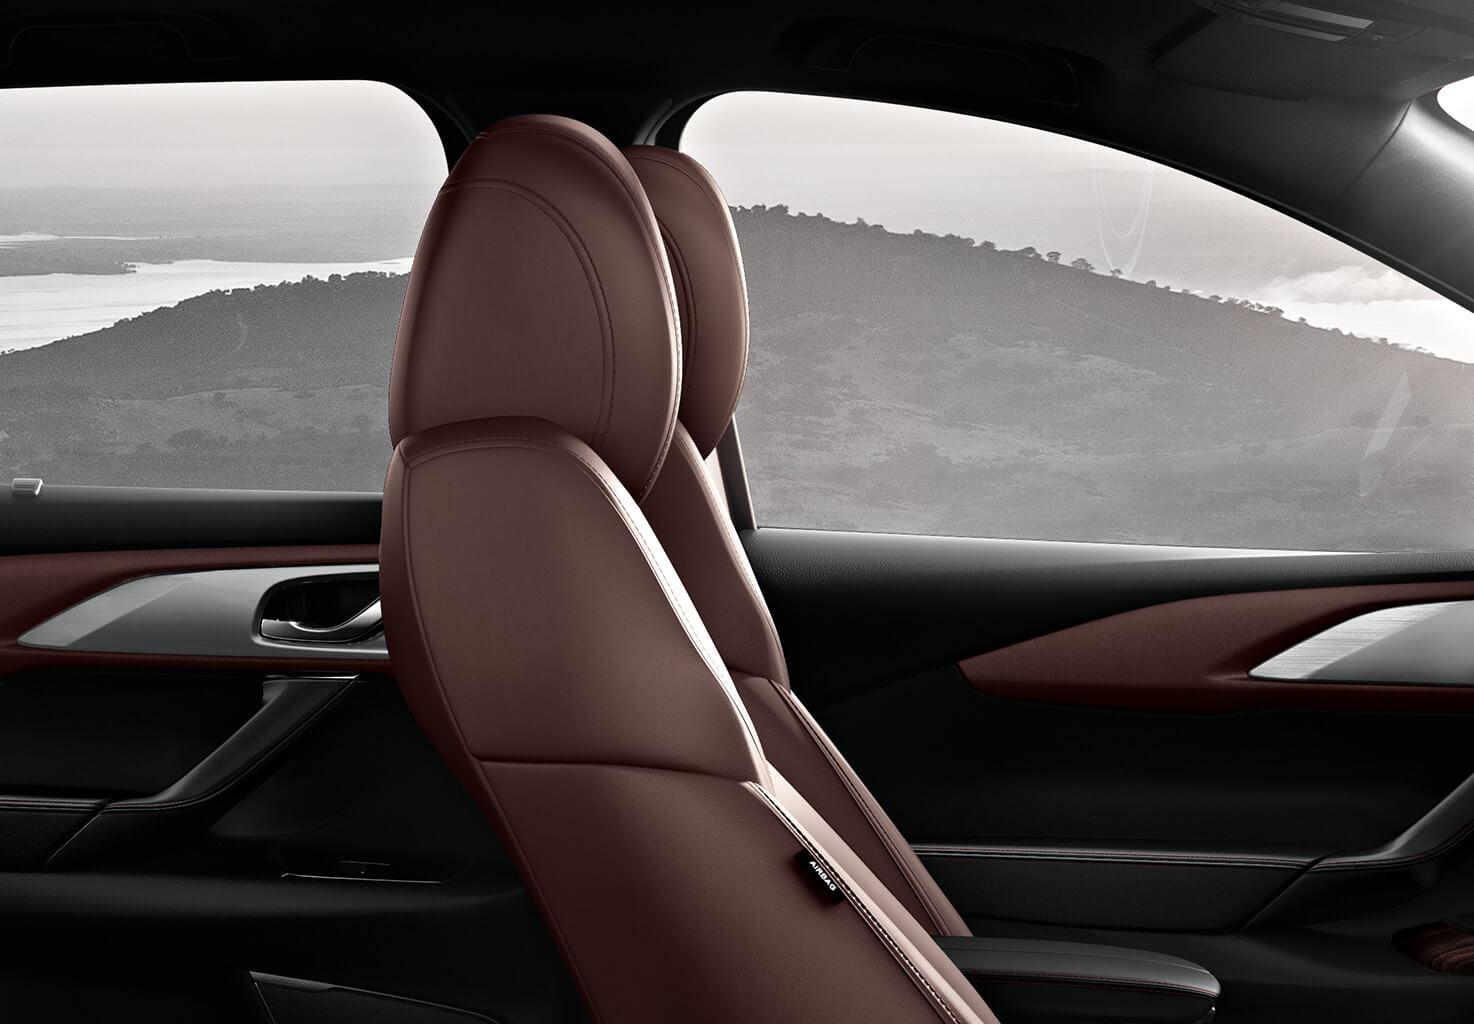 2016 cx9 brownleather interior assemble cx9 packages powerdrivers heatedfrontseatsandmirrors?w=370?w=370 2018 mazda cx 9 mazda usa  at bayanpartner.co